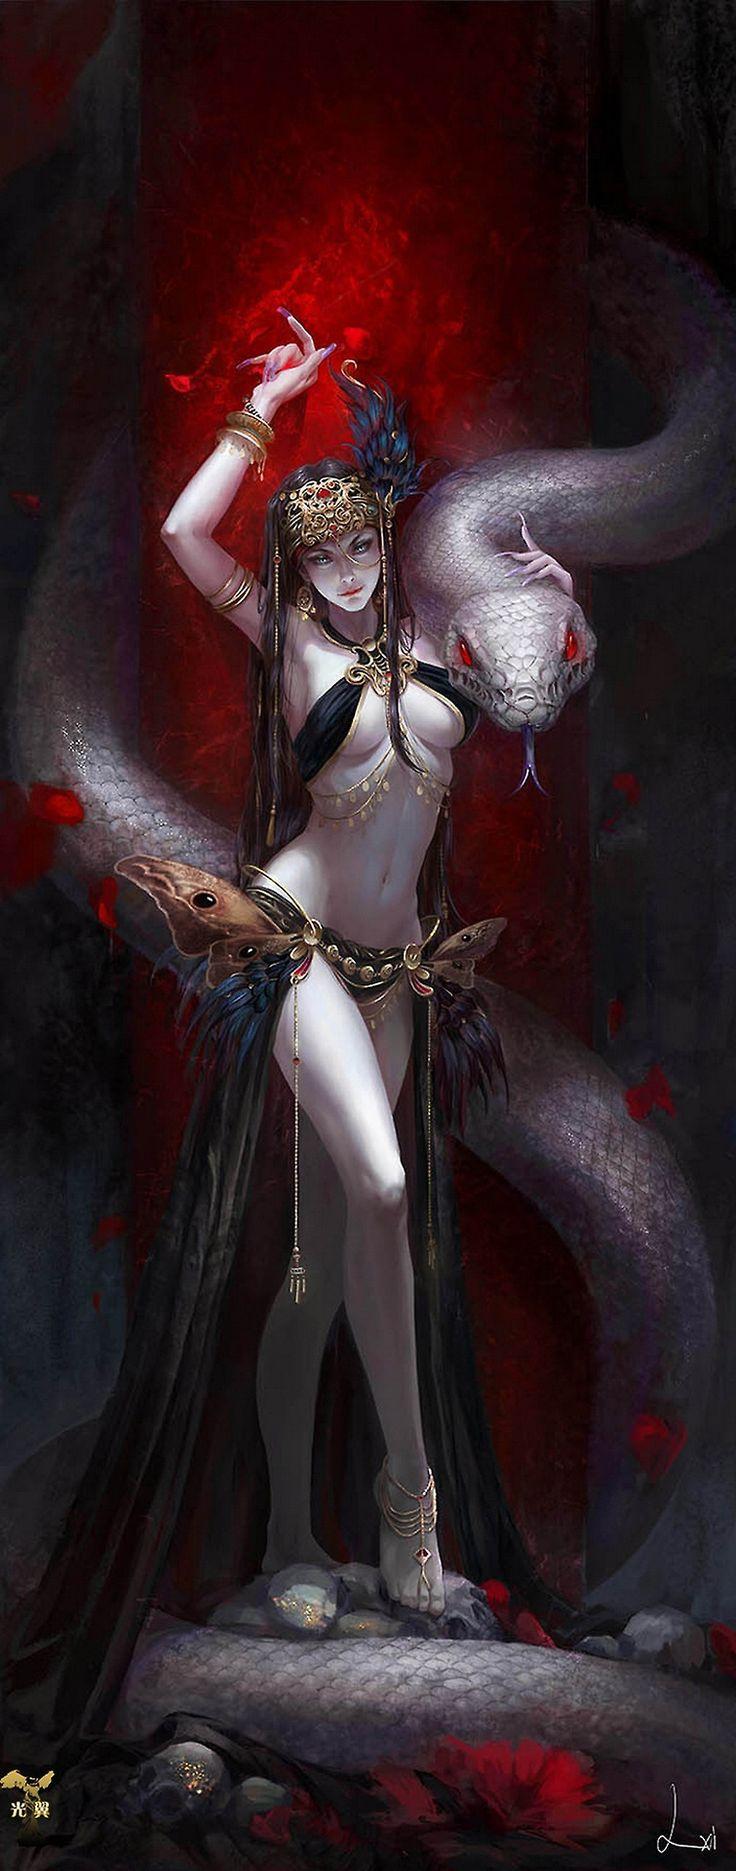 Fantasy art  - Page 24 163c98de10bdce71f791a015d68d09e2